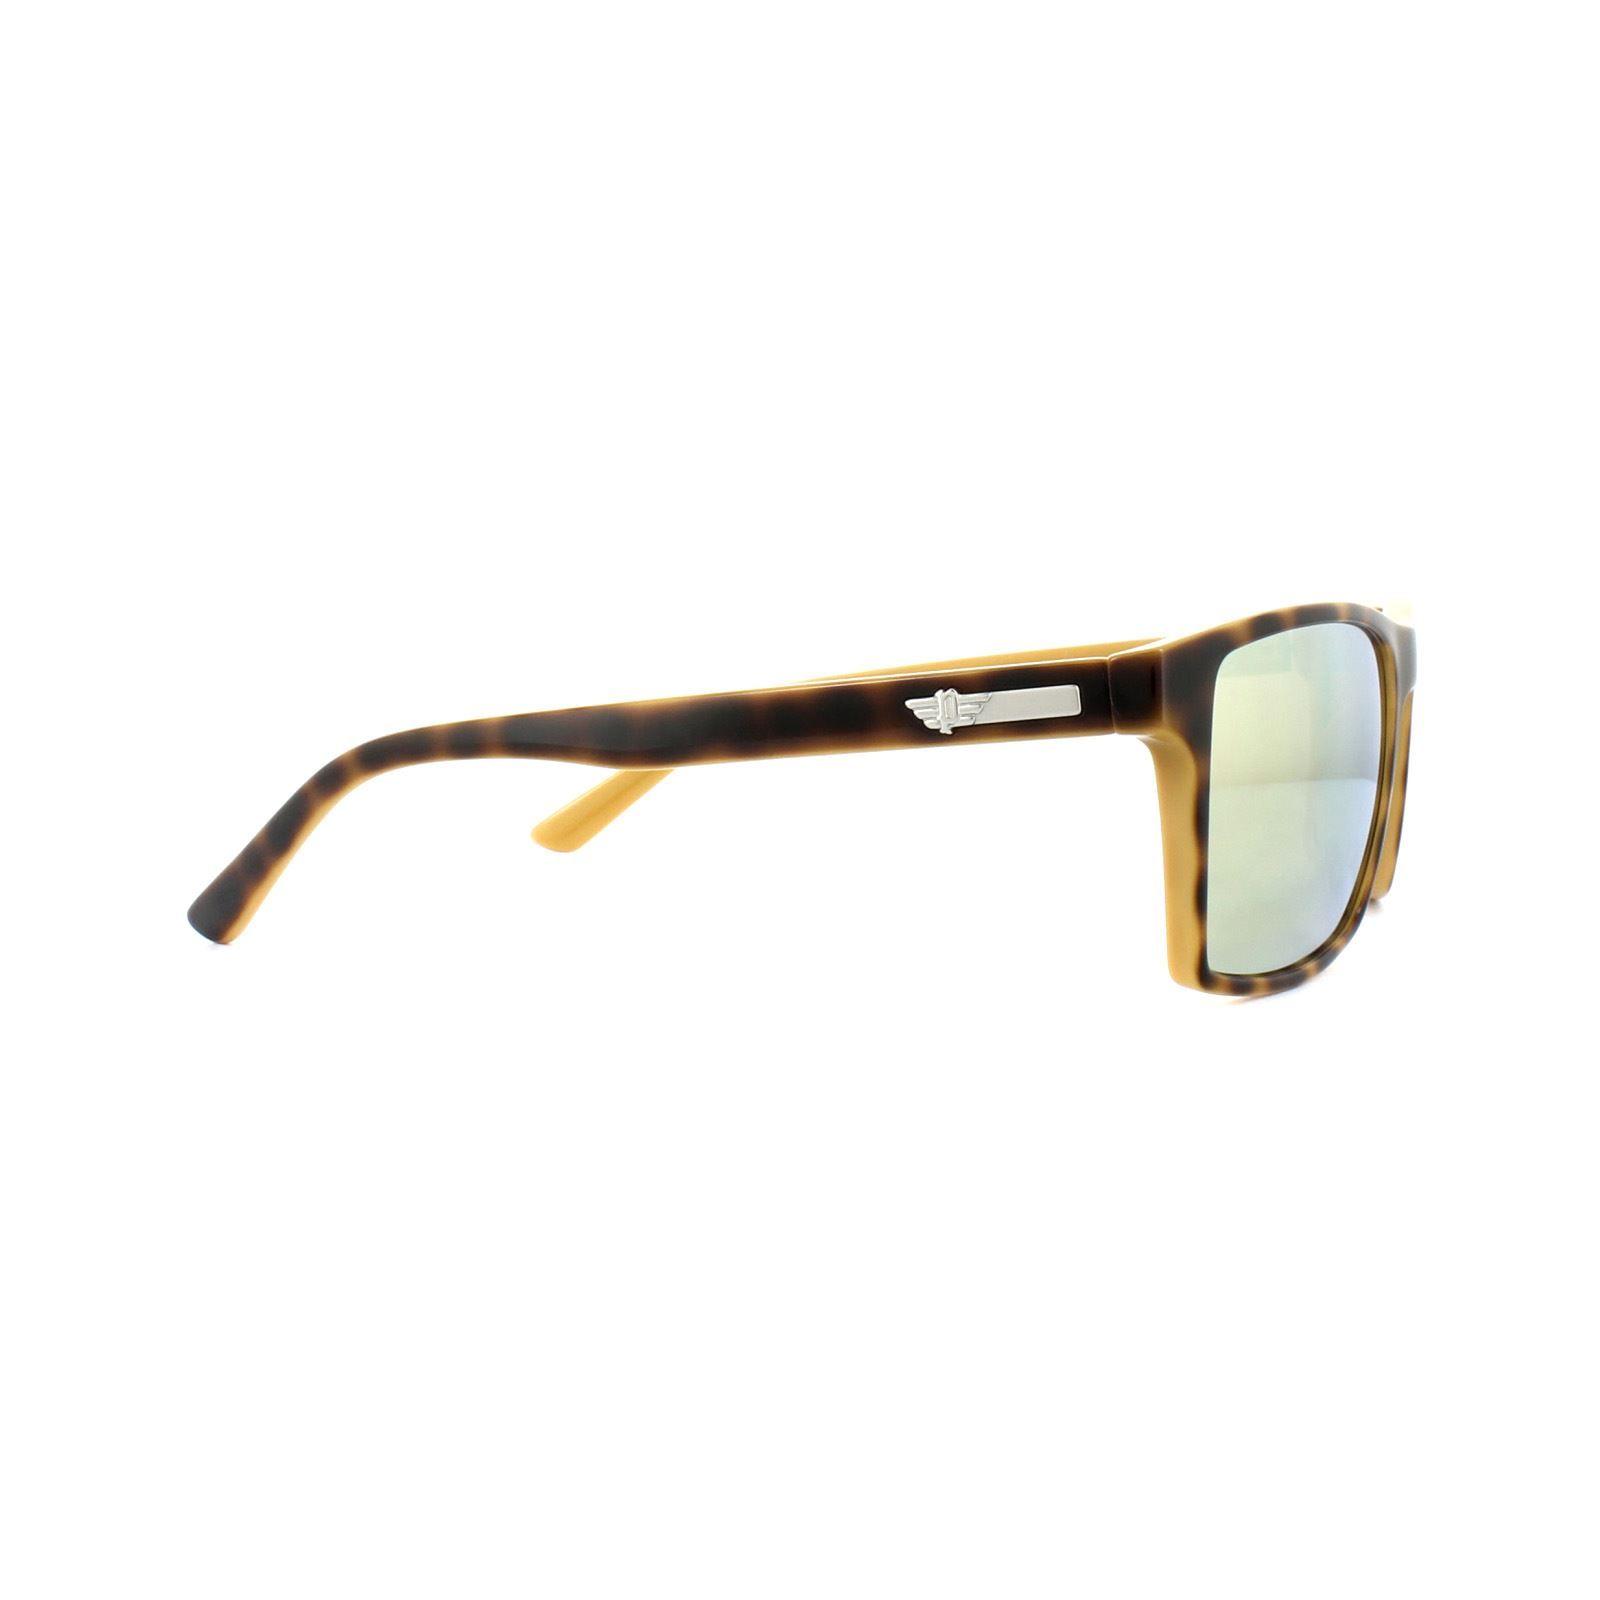 Police Sunglasses S1870M L50G Shiny Havana Ochre Grey